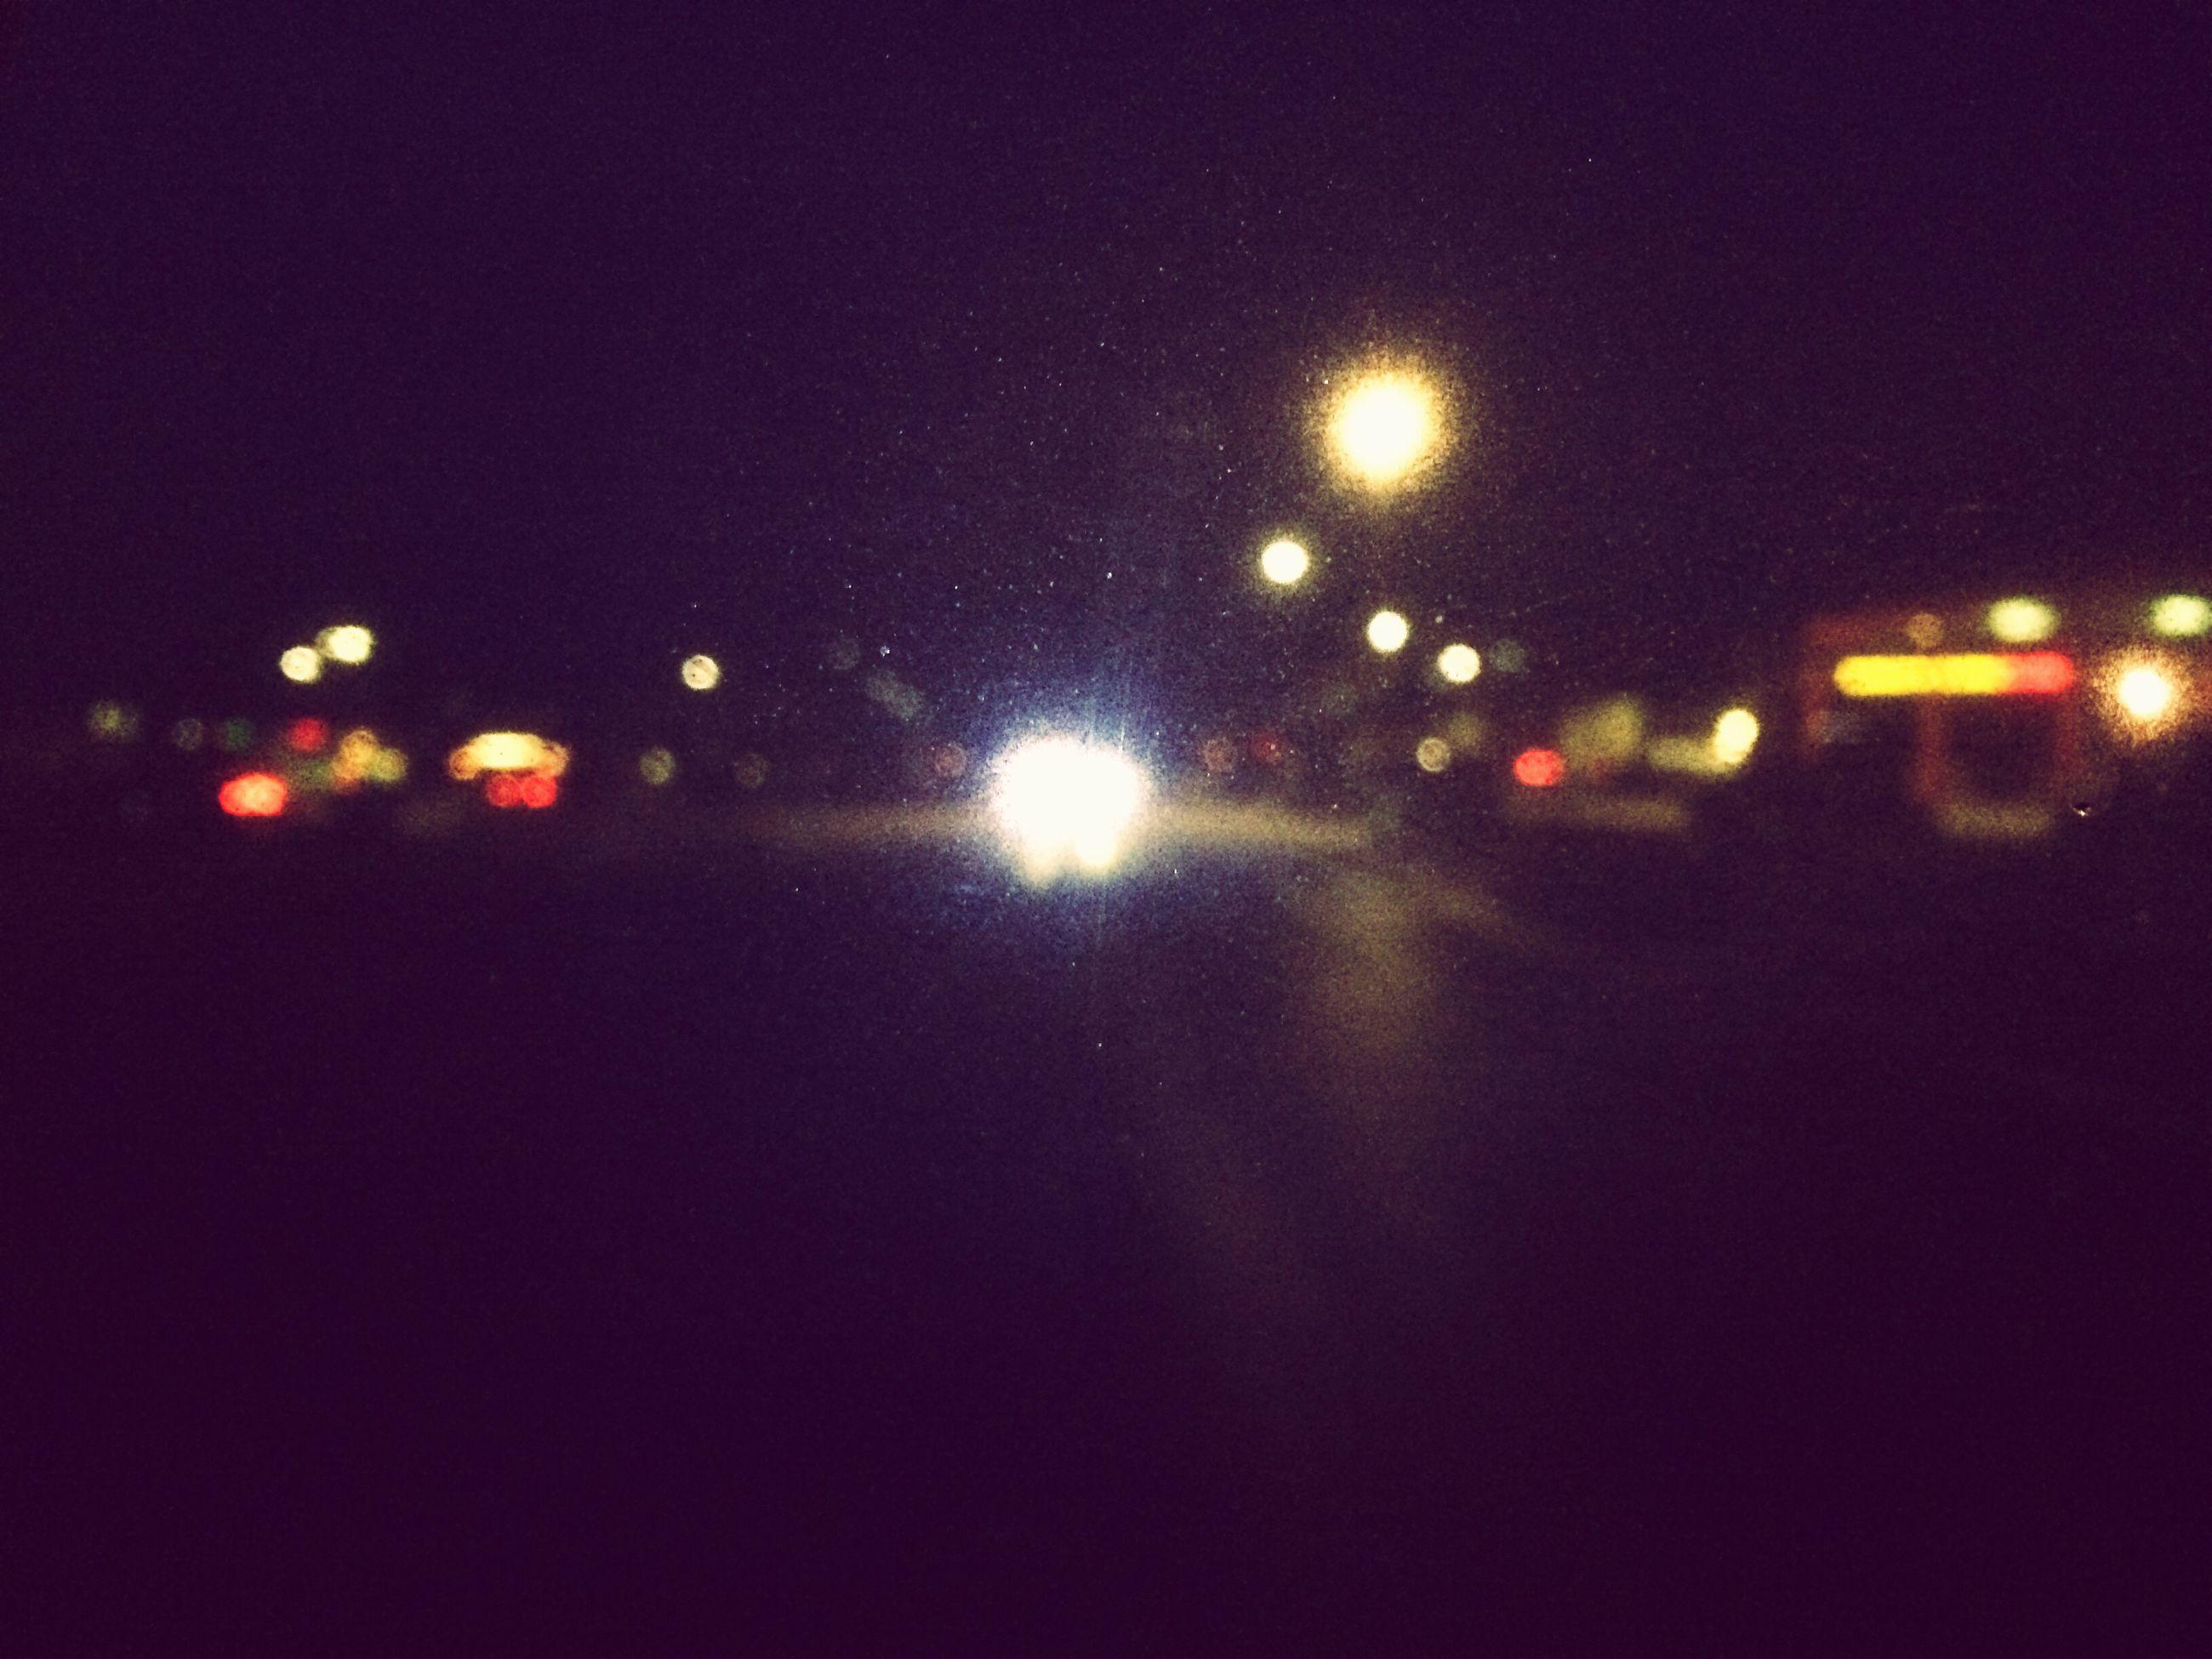 illuminated, night, transportation, no people, backgrounds, close-up, outdoors, sky, nature